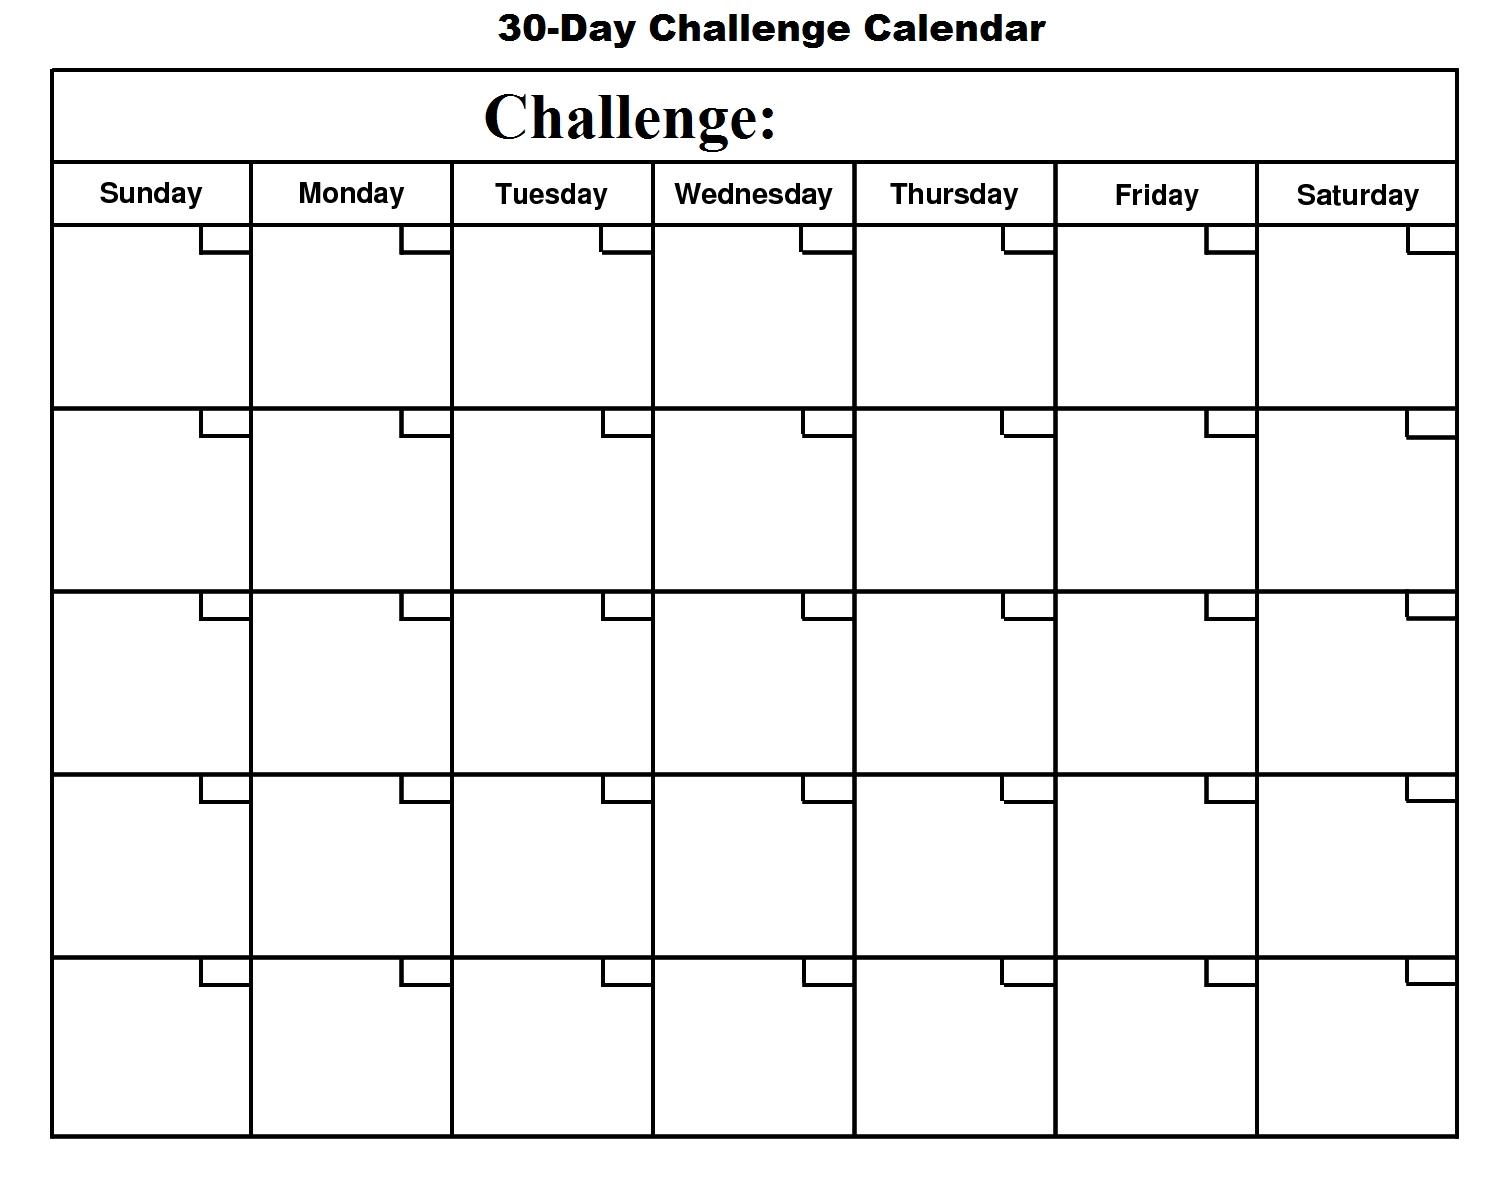 Blank 30 Day Month Calendar | Example Calendar Printable pertaining to 30 Day Calendar Blank